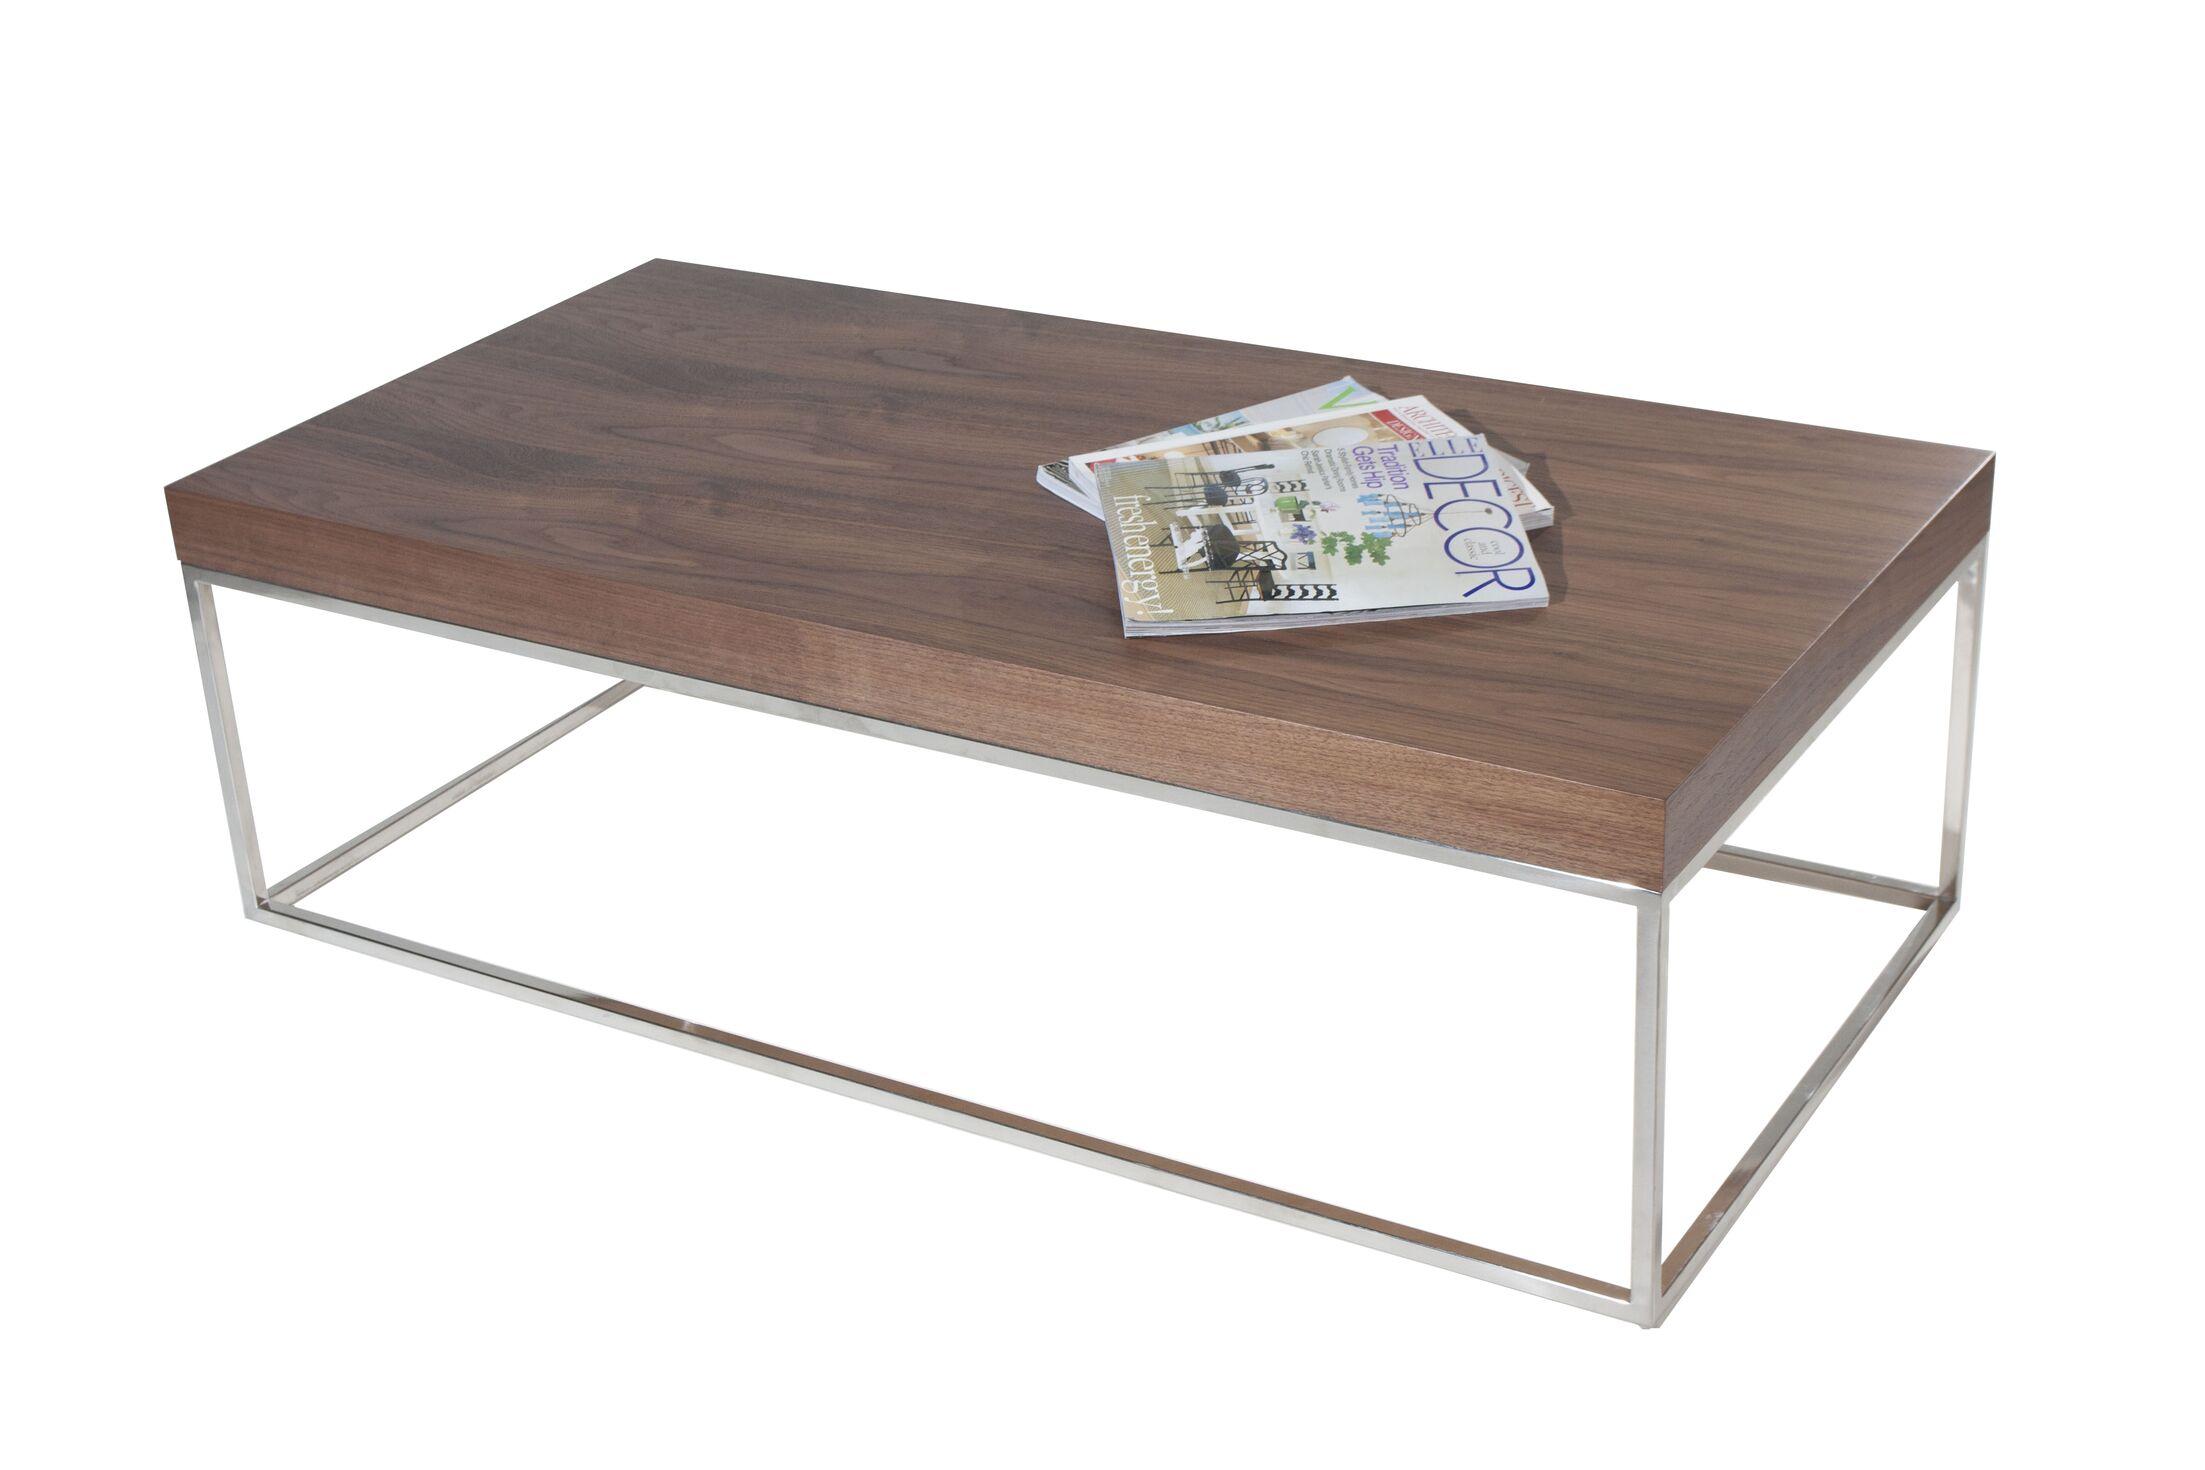 Mcnair Coffee Table Color: Hazelnut